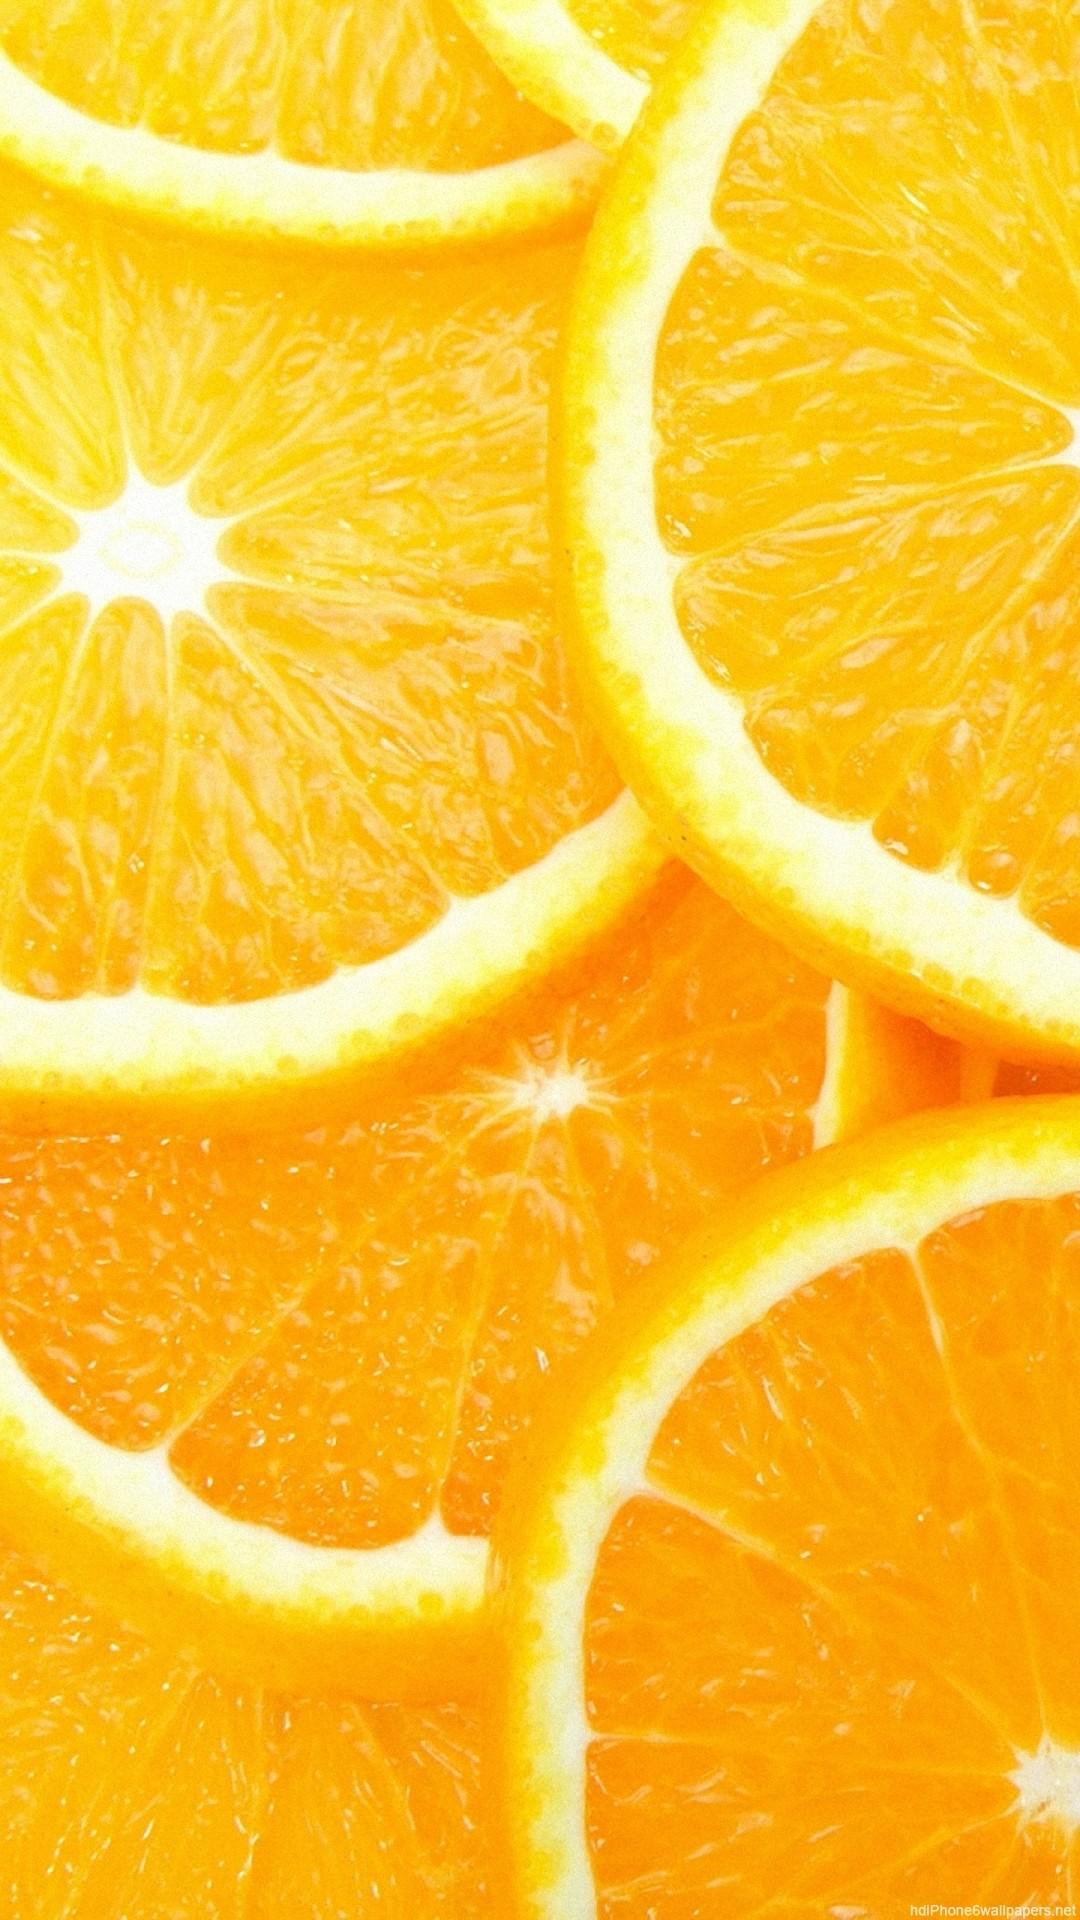 HD sweet fruit orange iphone 6 wallpaper